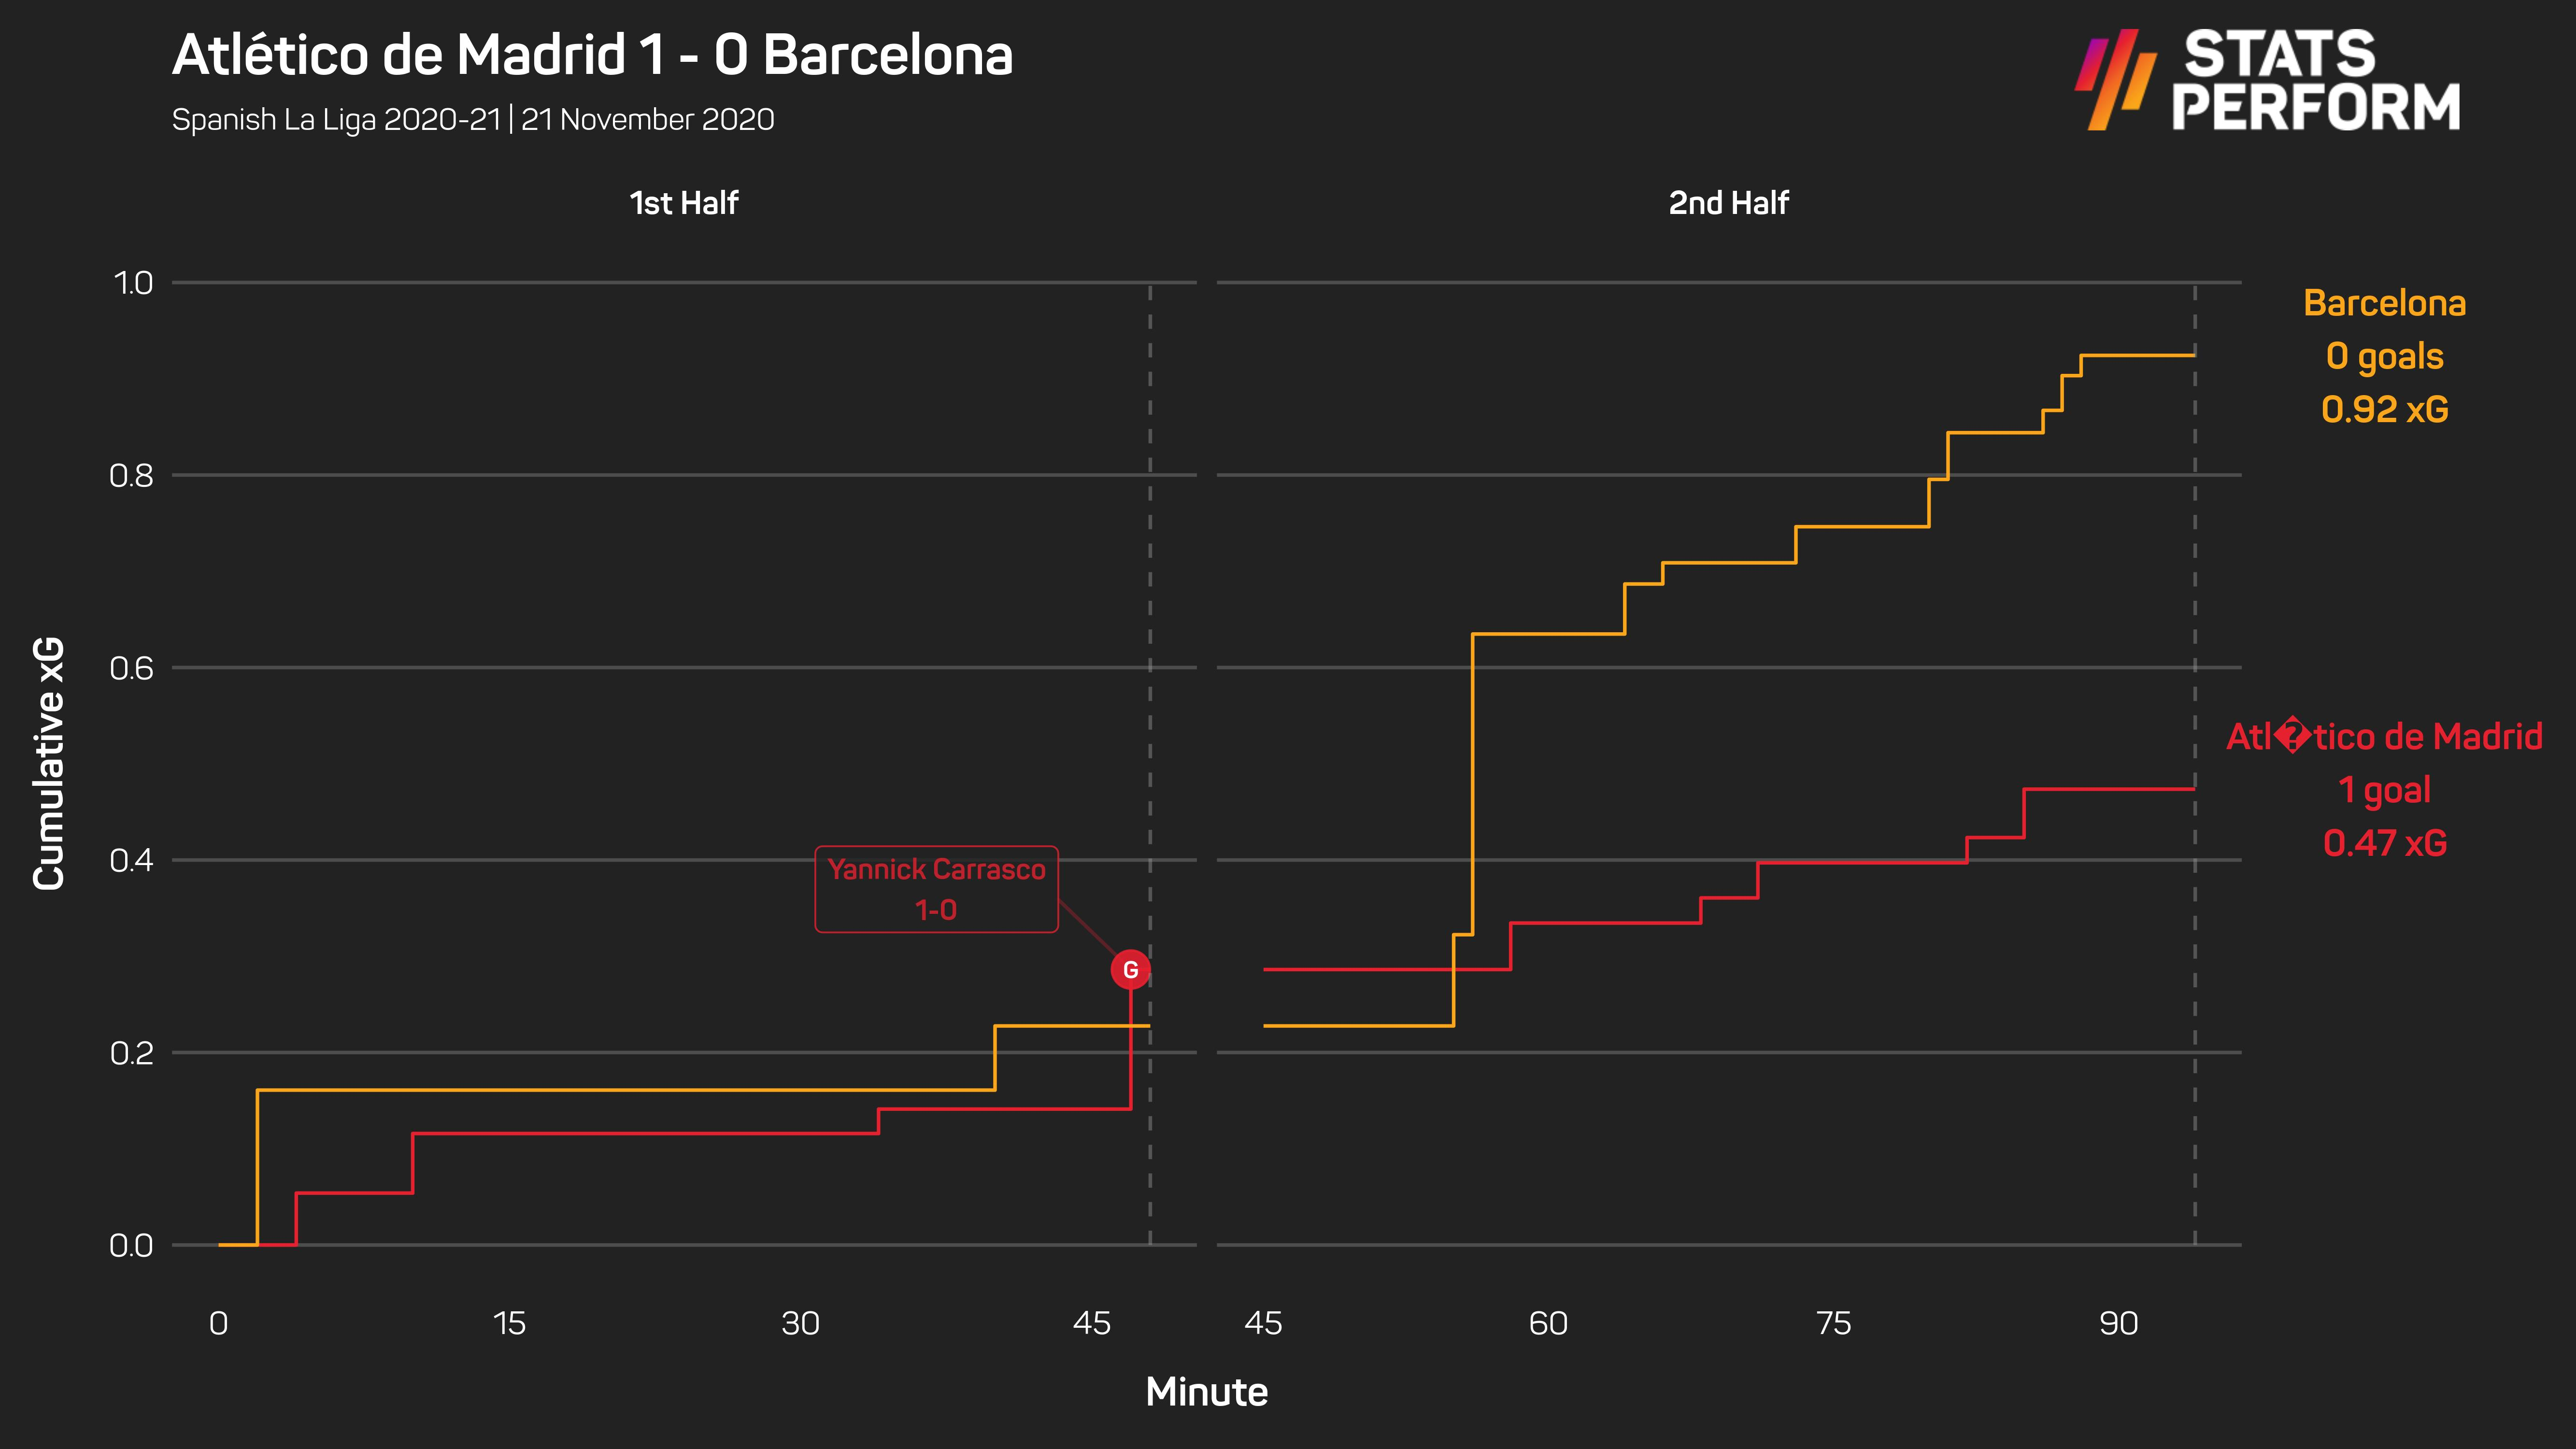 Atletico Madrid 1-0 Barcelona xG race